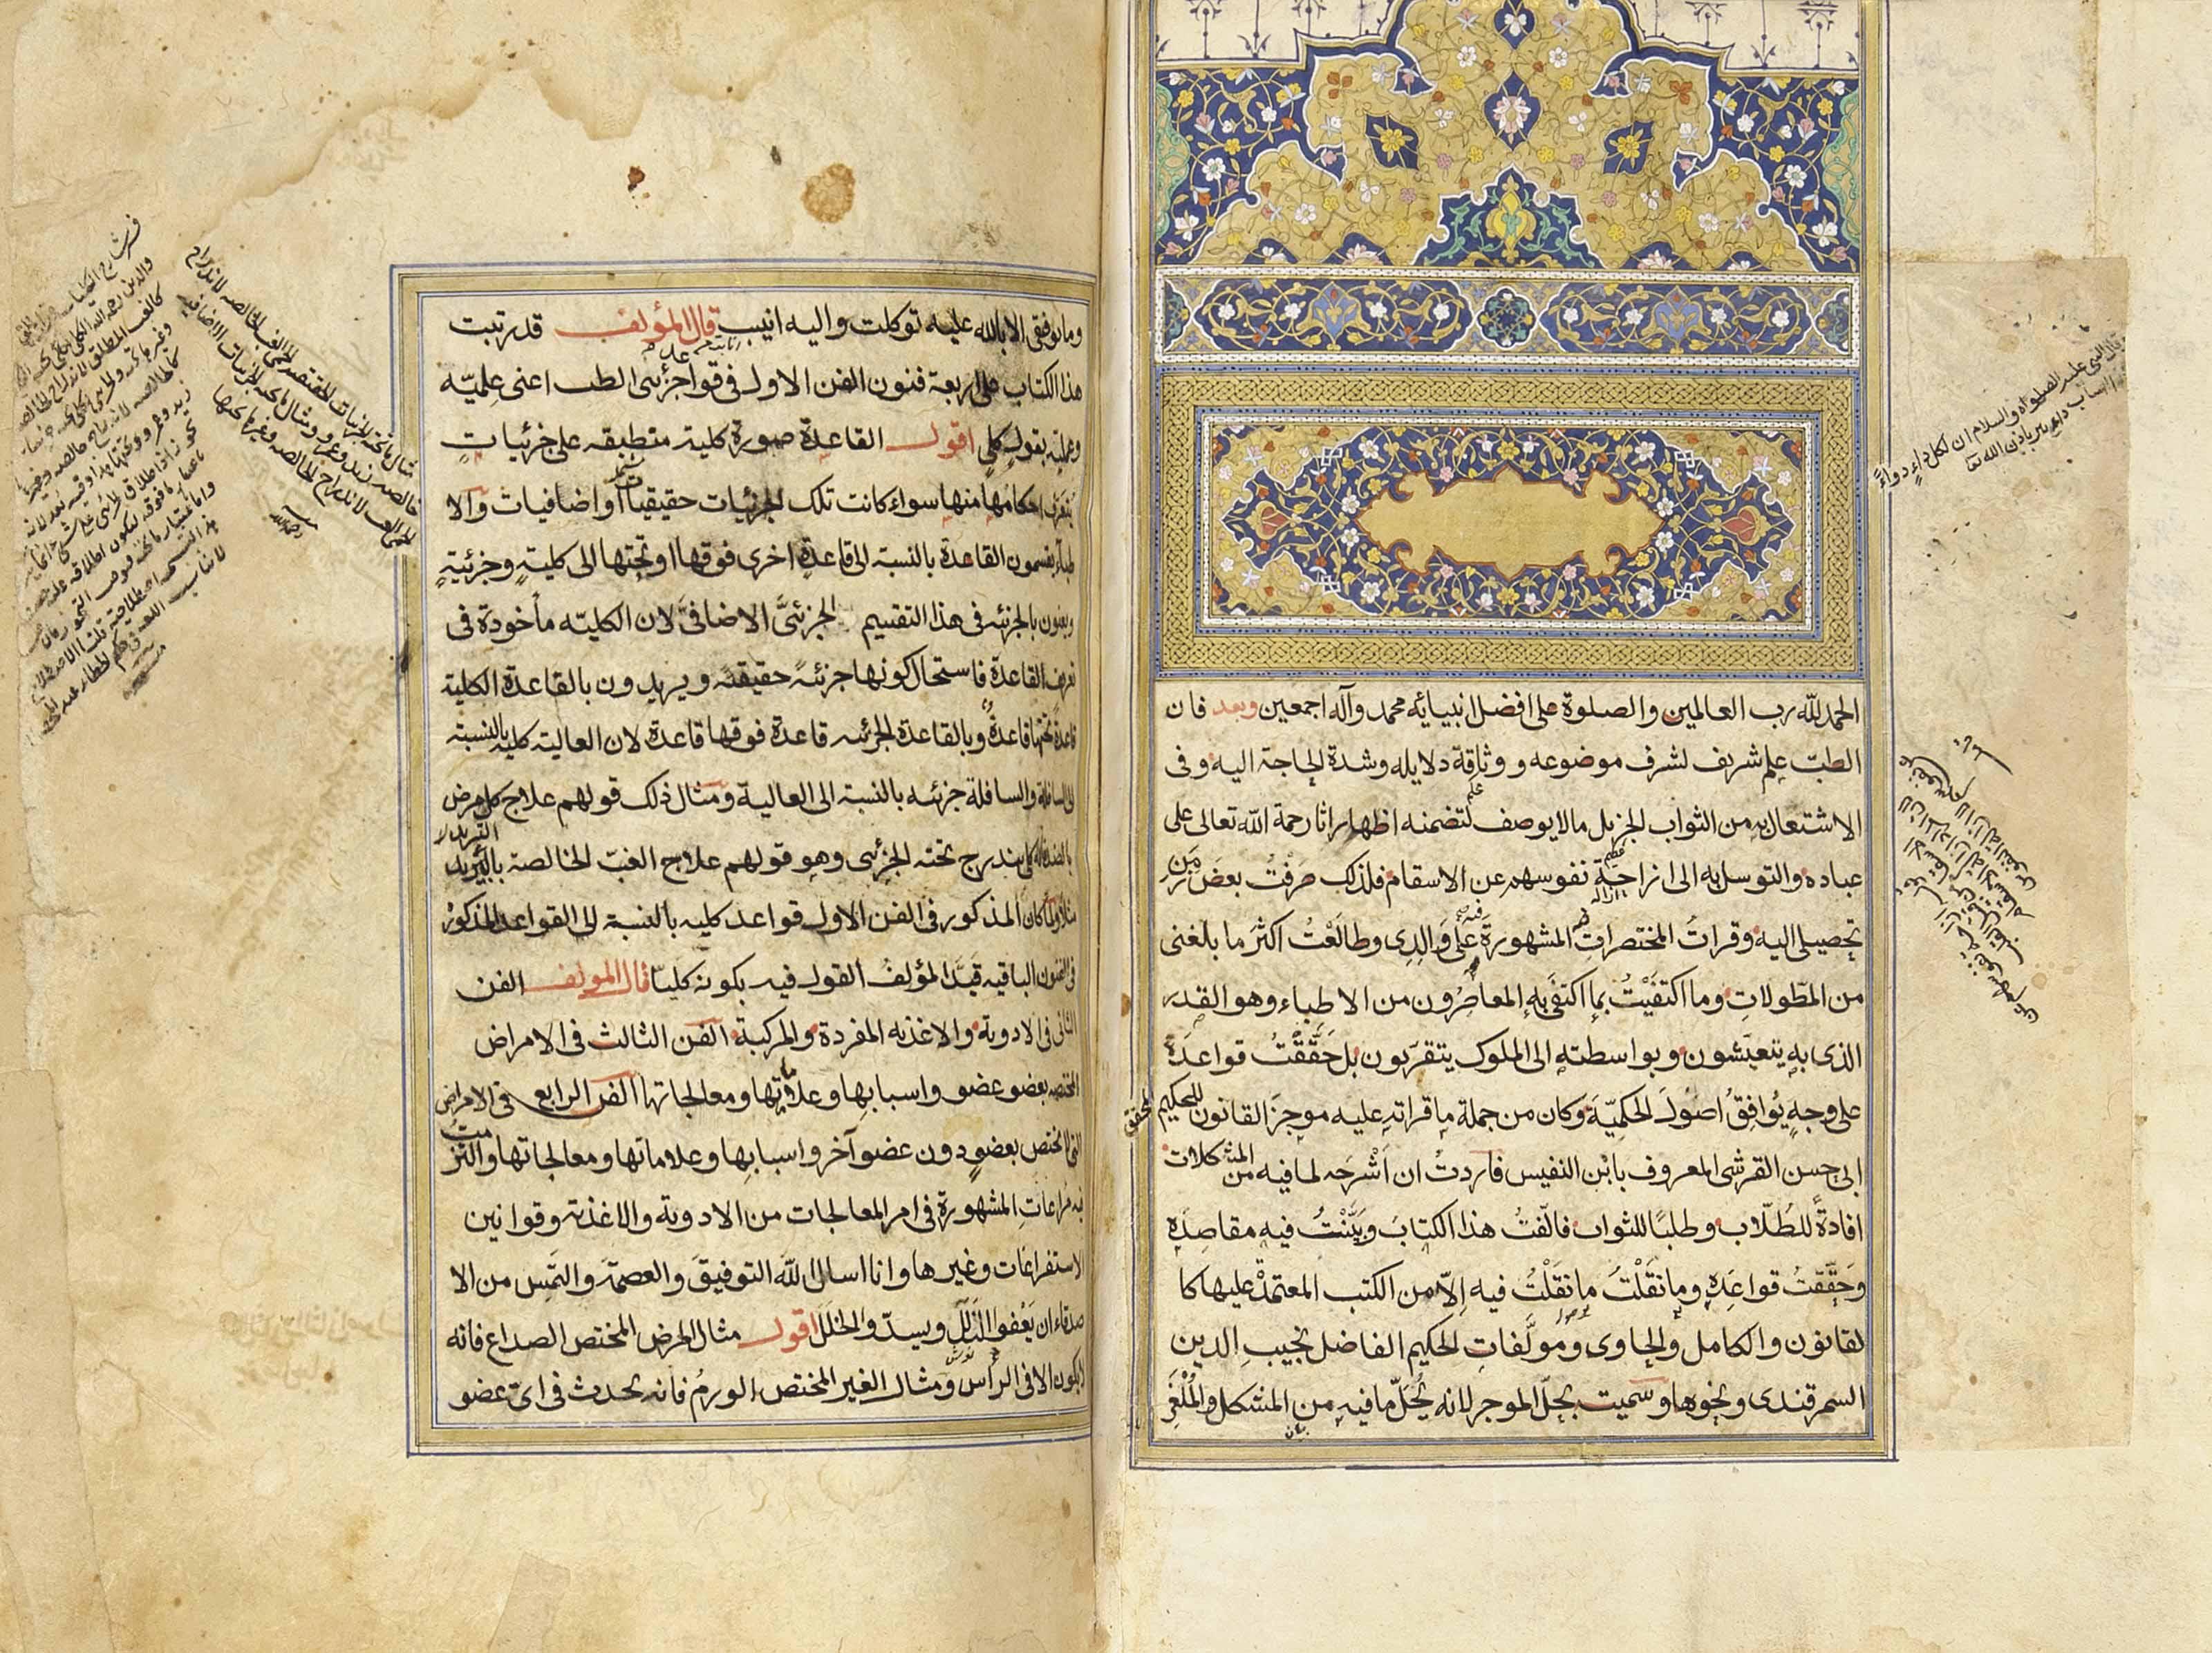 JAMAL AL-DIN MUHAMMAD BIN MUHAMMAD AL-AQSARA'I (D. 1377-78 AD): HALL AL-MUJIZ (THE RESOLUTION OF THE MUJIZ)